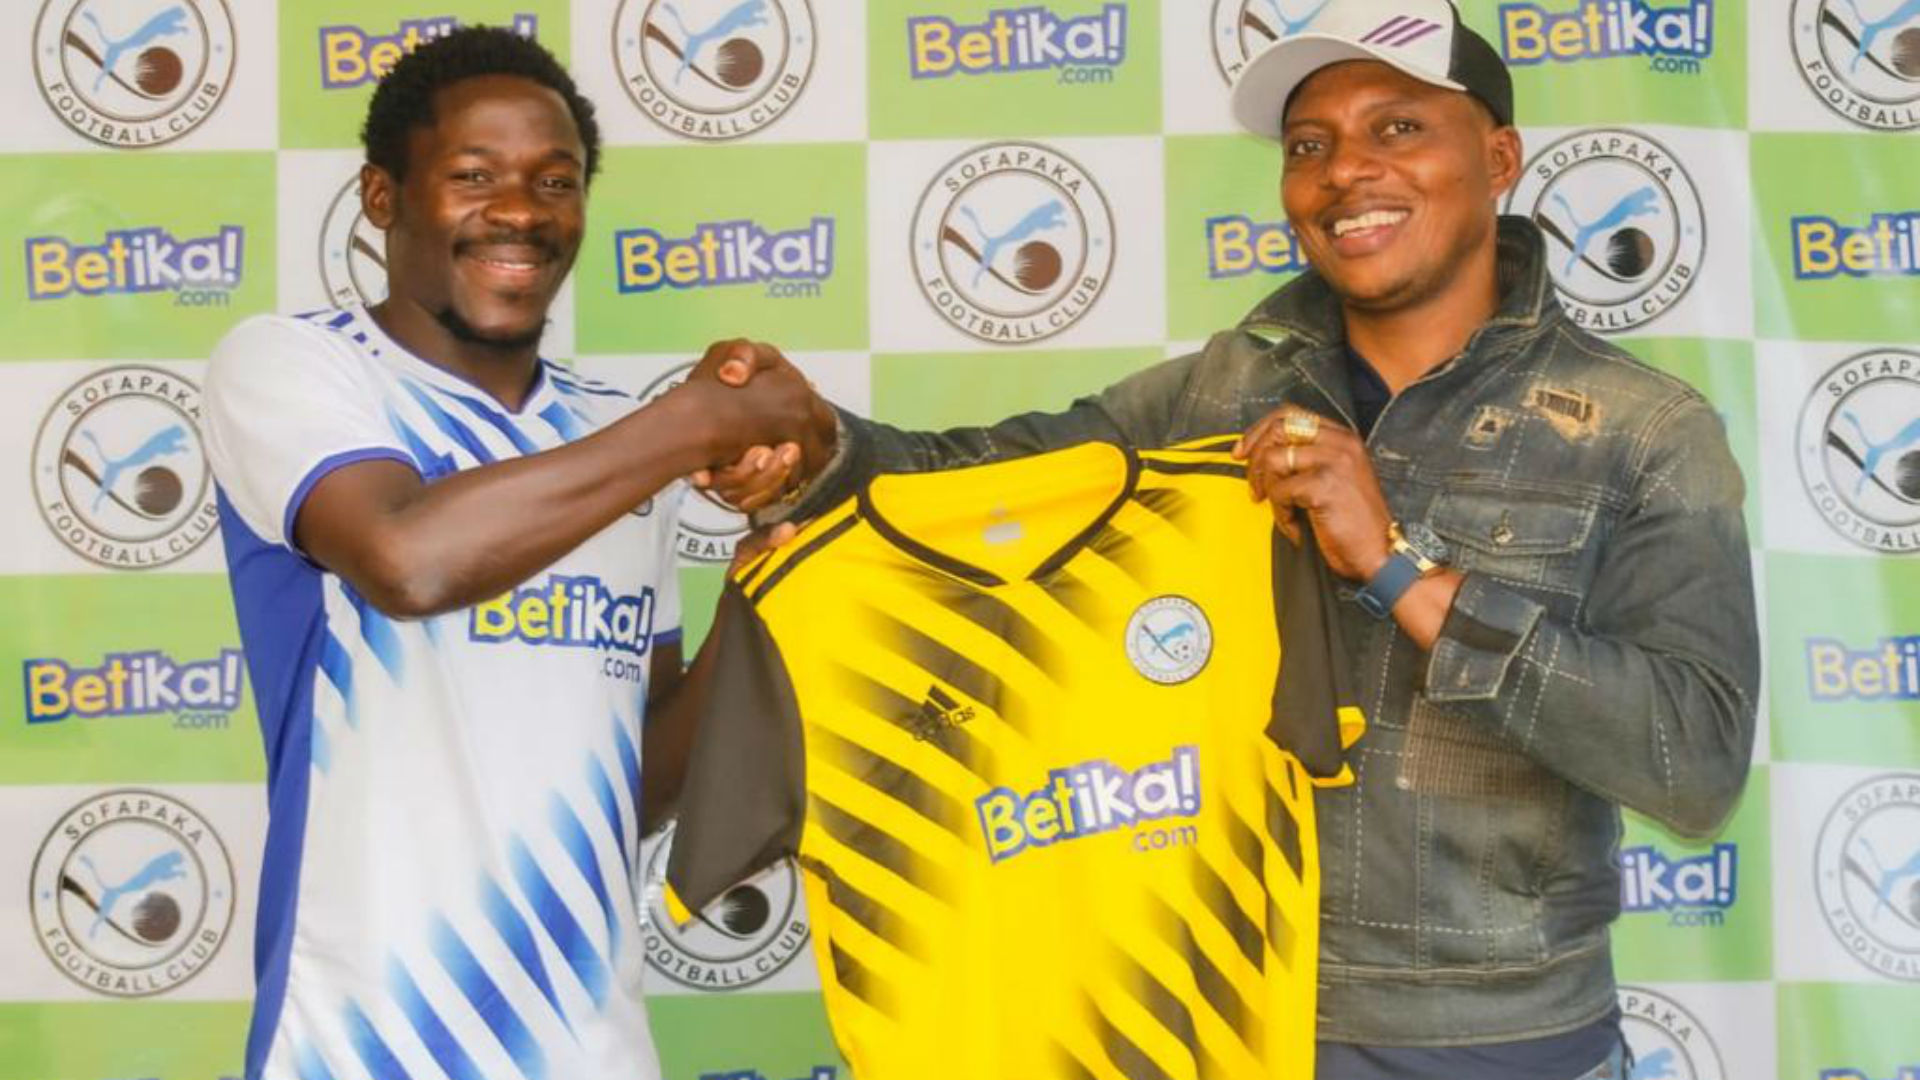 'Football is business' – Why Kalekwa spent billions to sustain Sofapaka